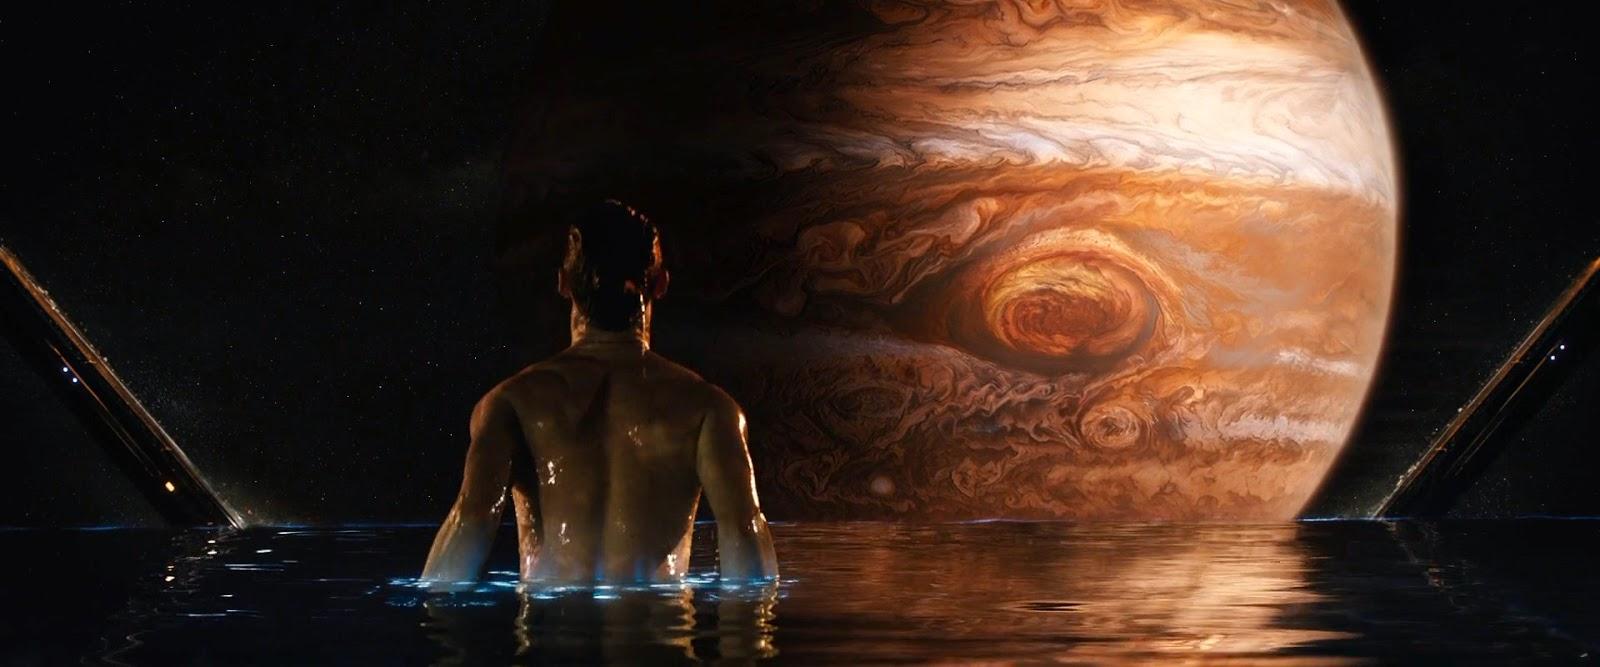 Jupiter Ascending (2015) 1080p S3 s Jupiter Ascending (2015) 1080p